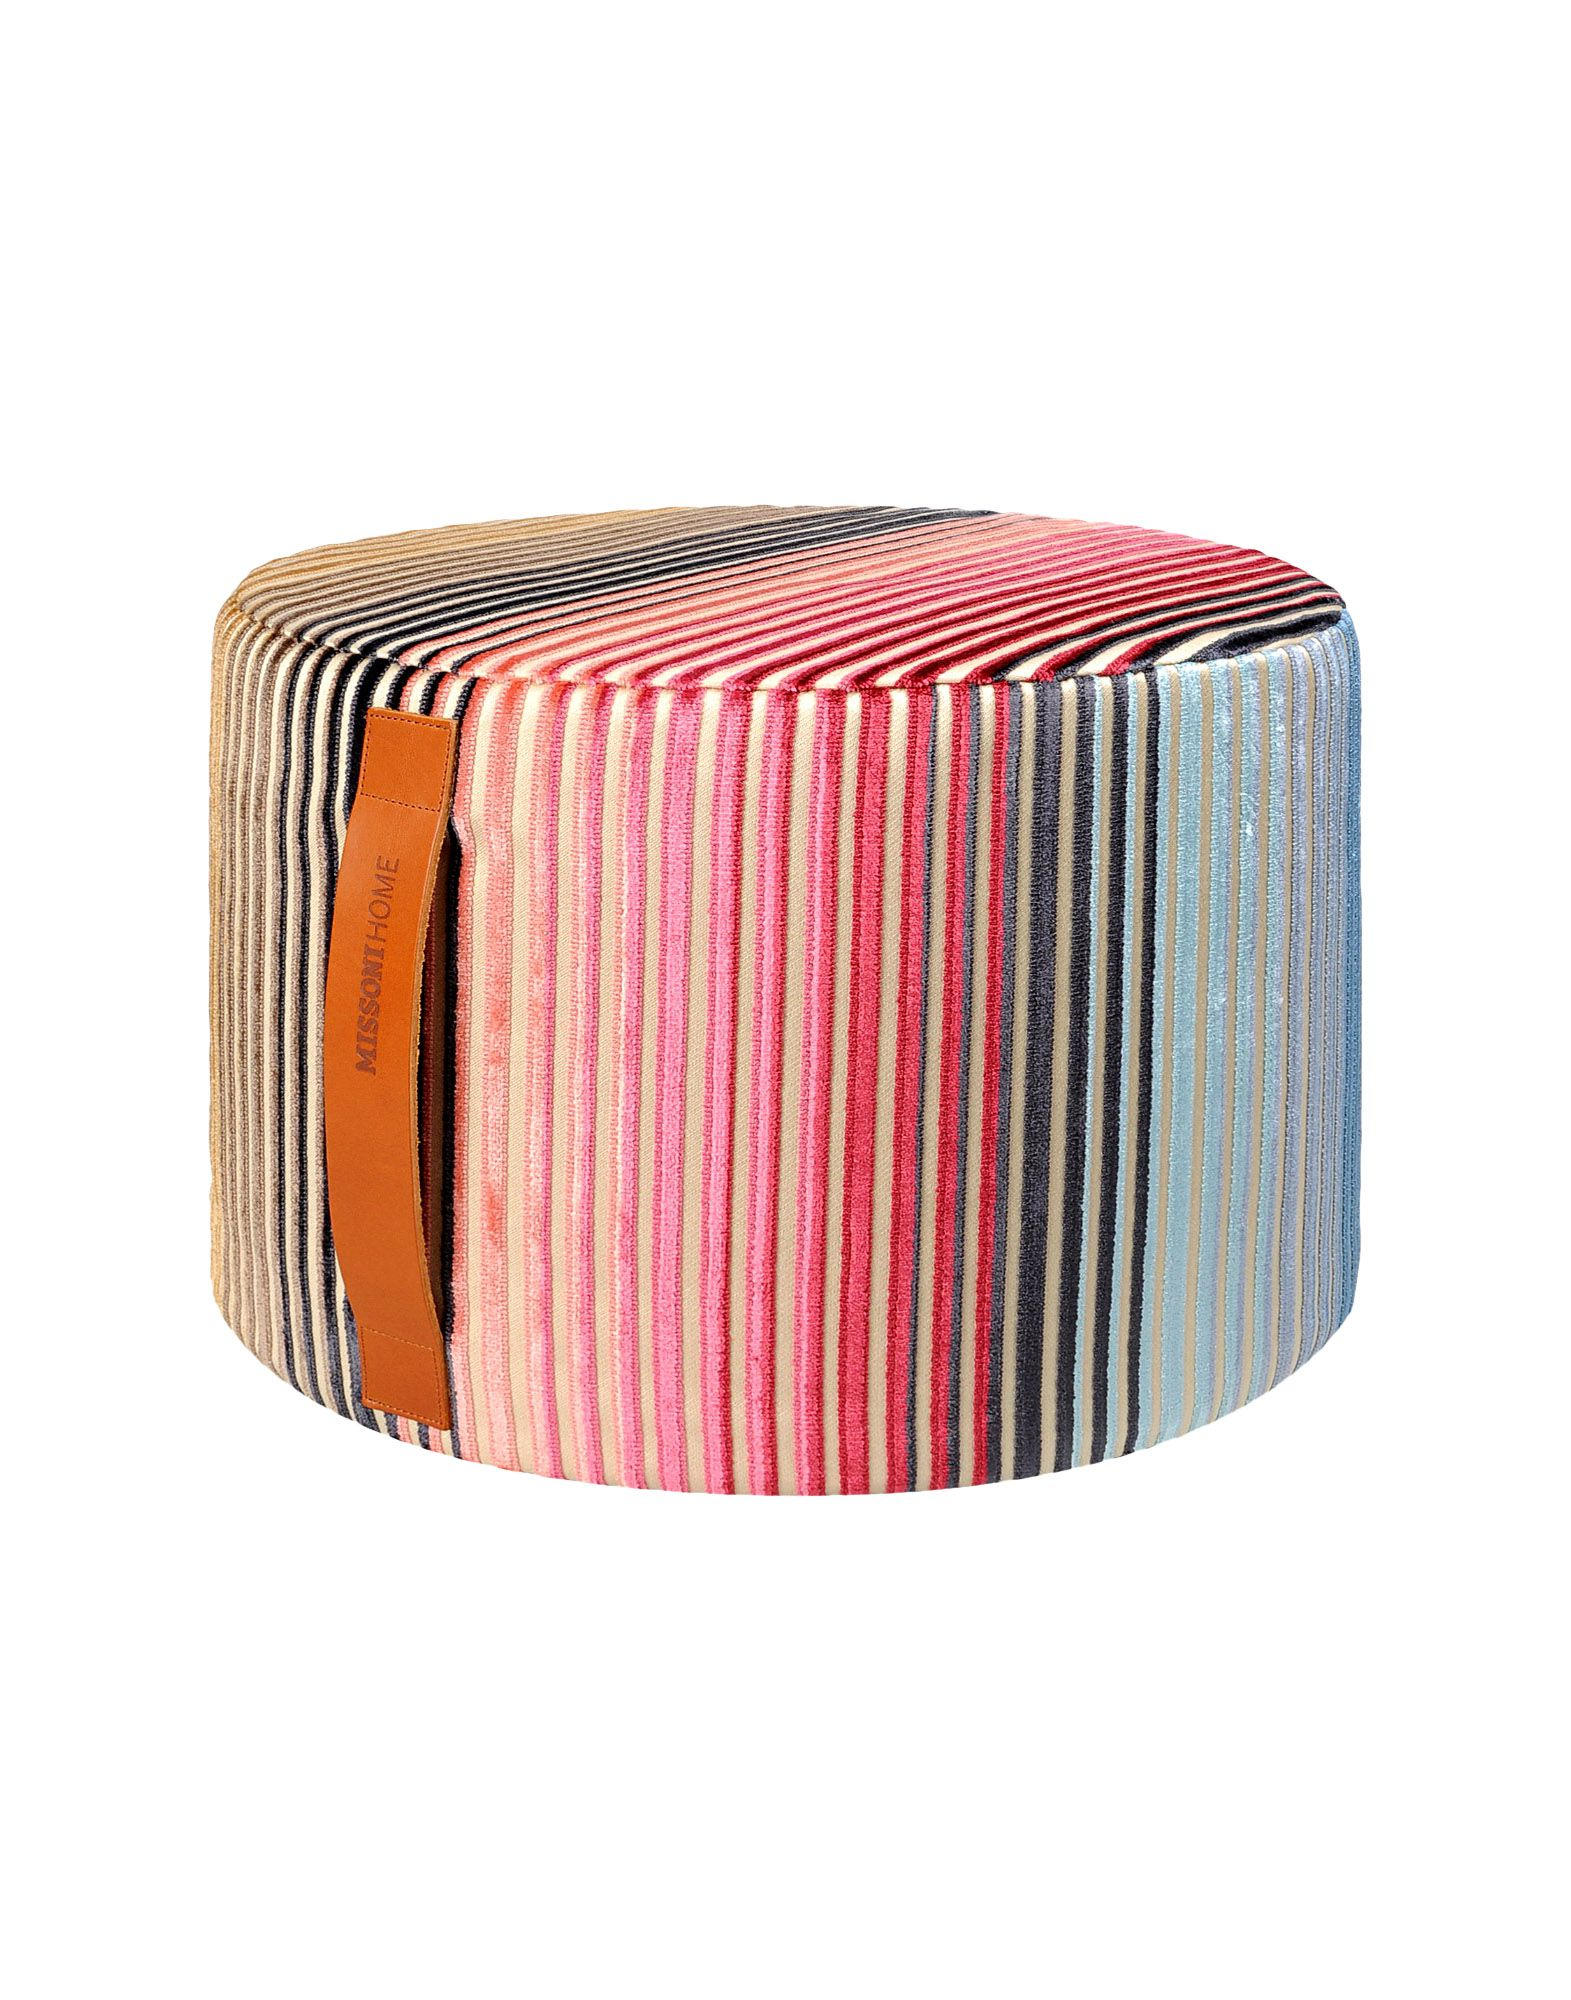 MISSONI HOME Chairs